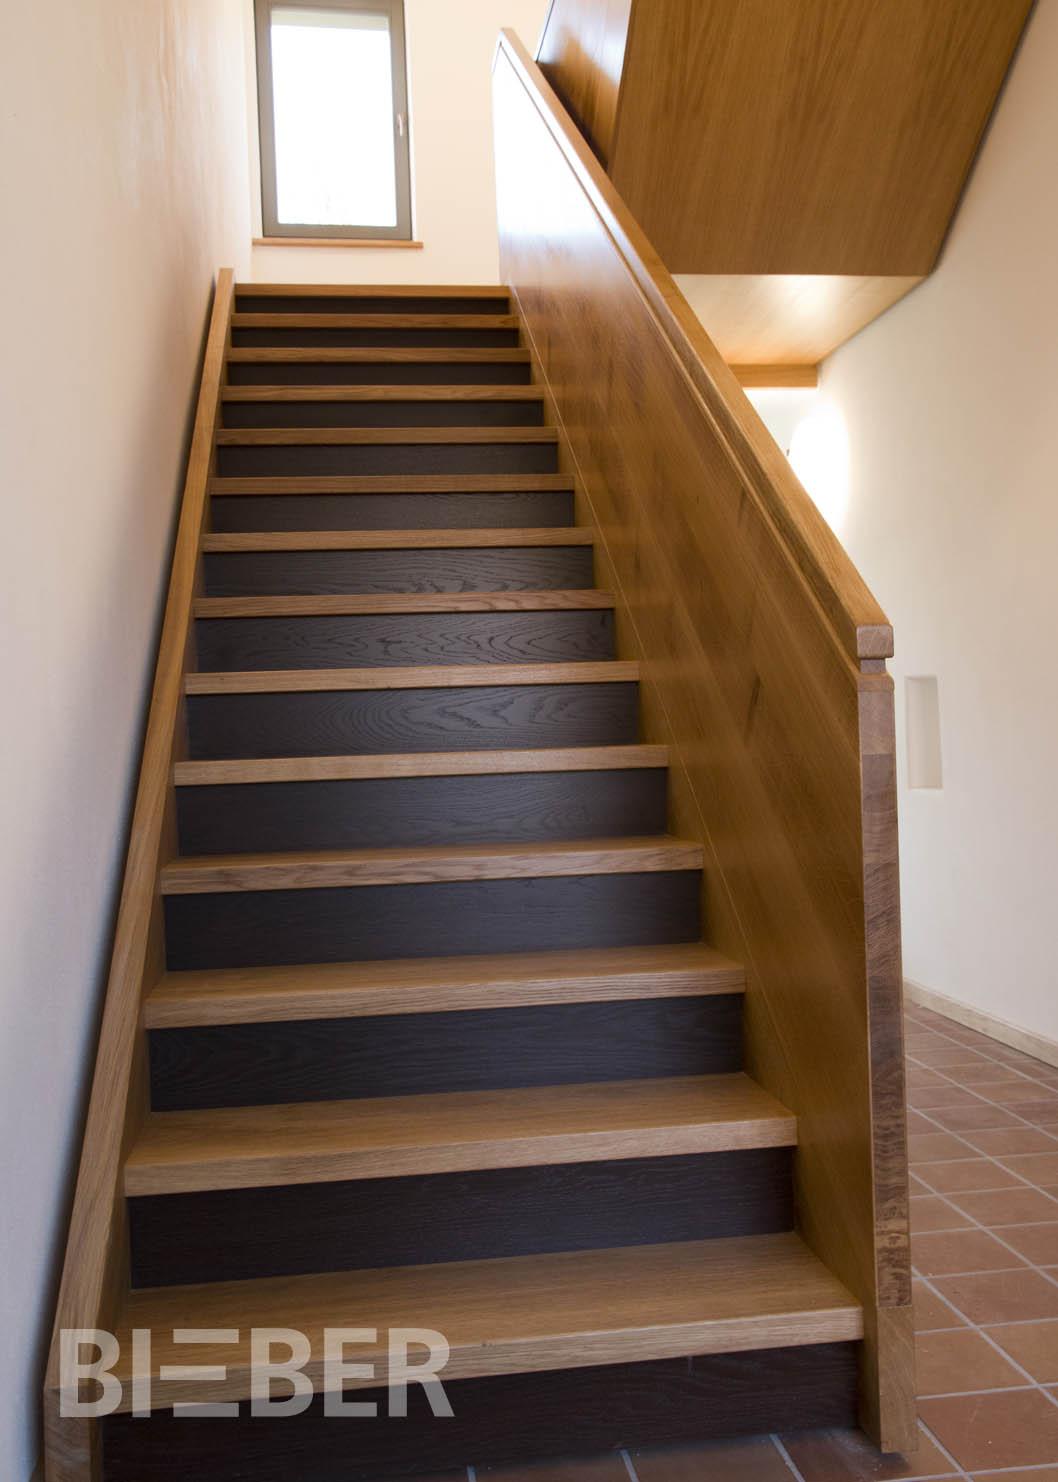 treppe verkleiden amazing wunderschne offene treppe with treppe verkleiden treppe verkleiden. Black Bedroom Furniture Sets. Home Design Ideas